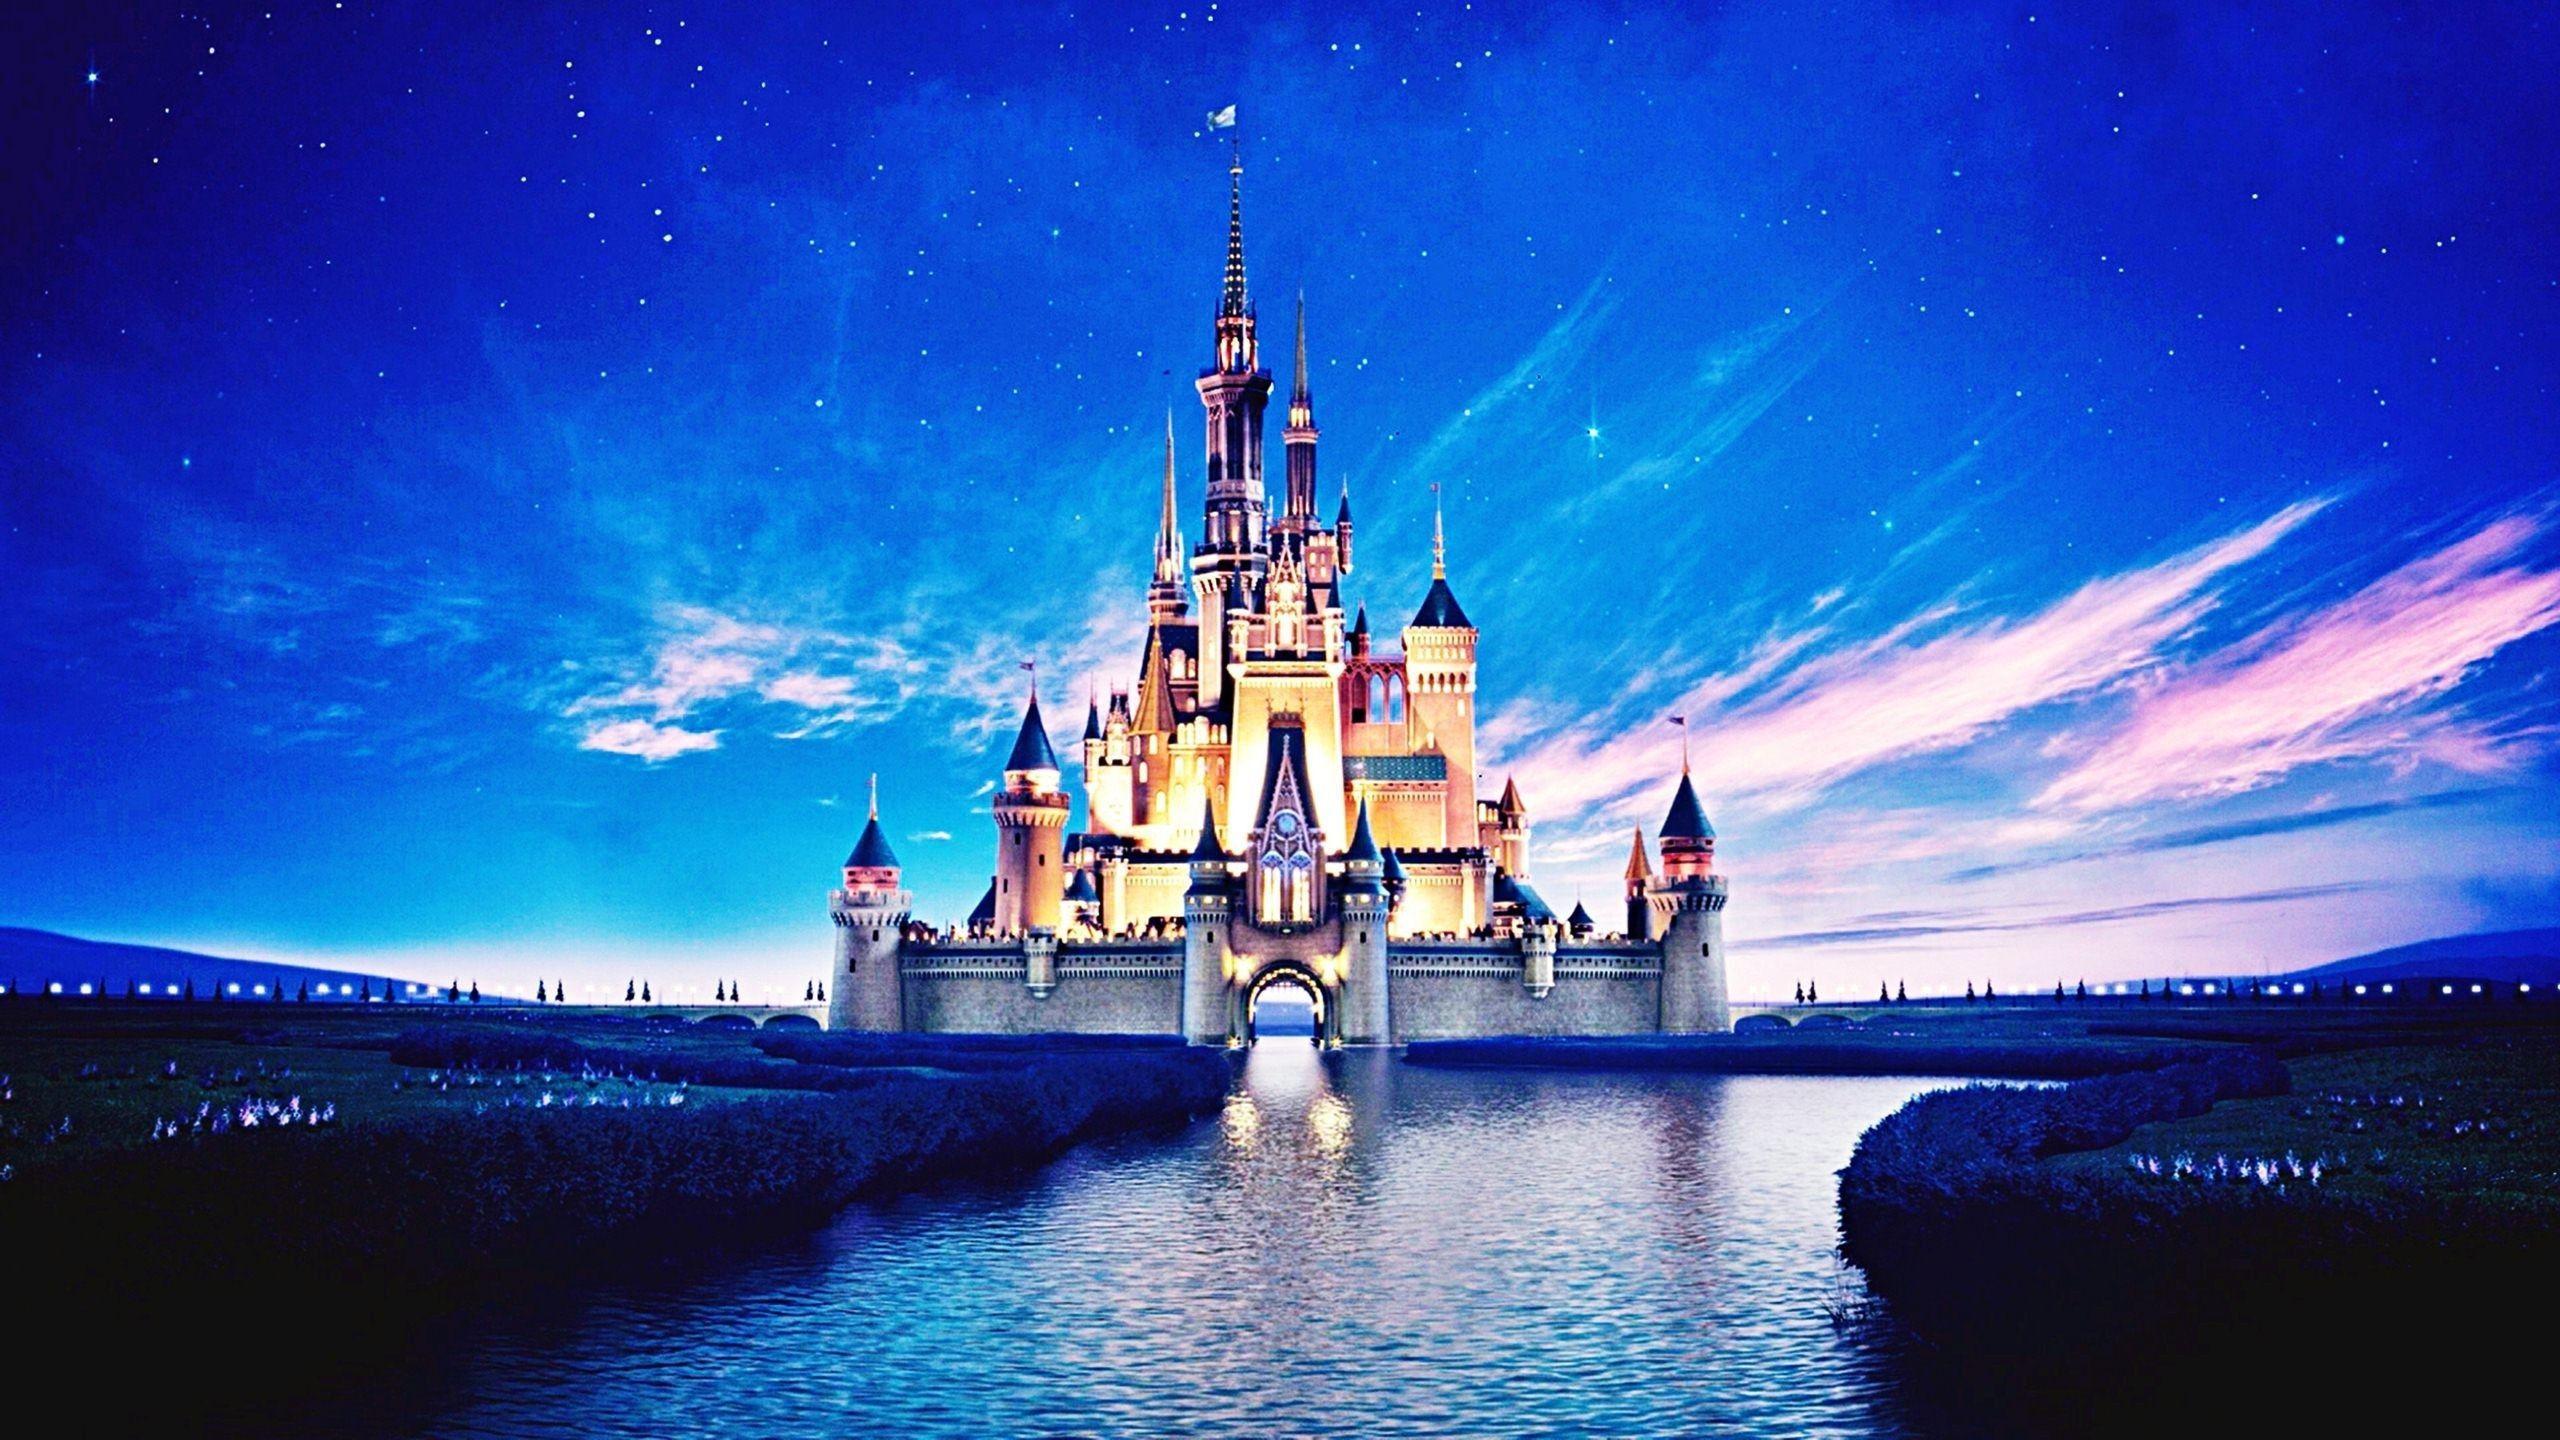 Disney Laptop Wallpapers Top Free Disney Laptop Backgrounds Wallpaperaccess